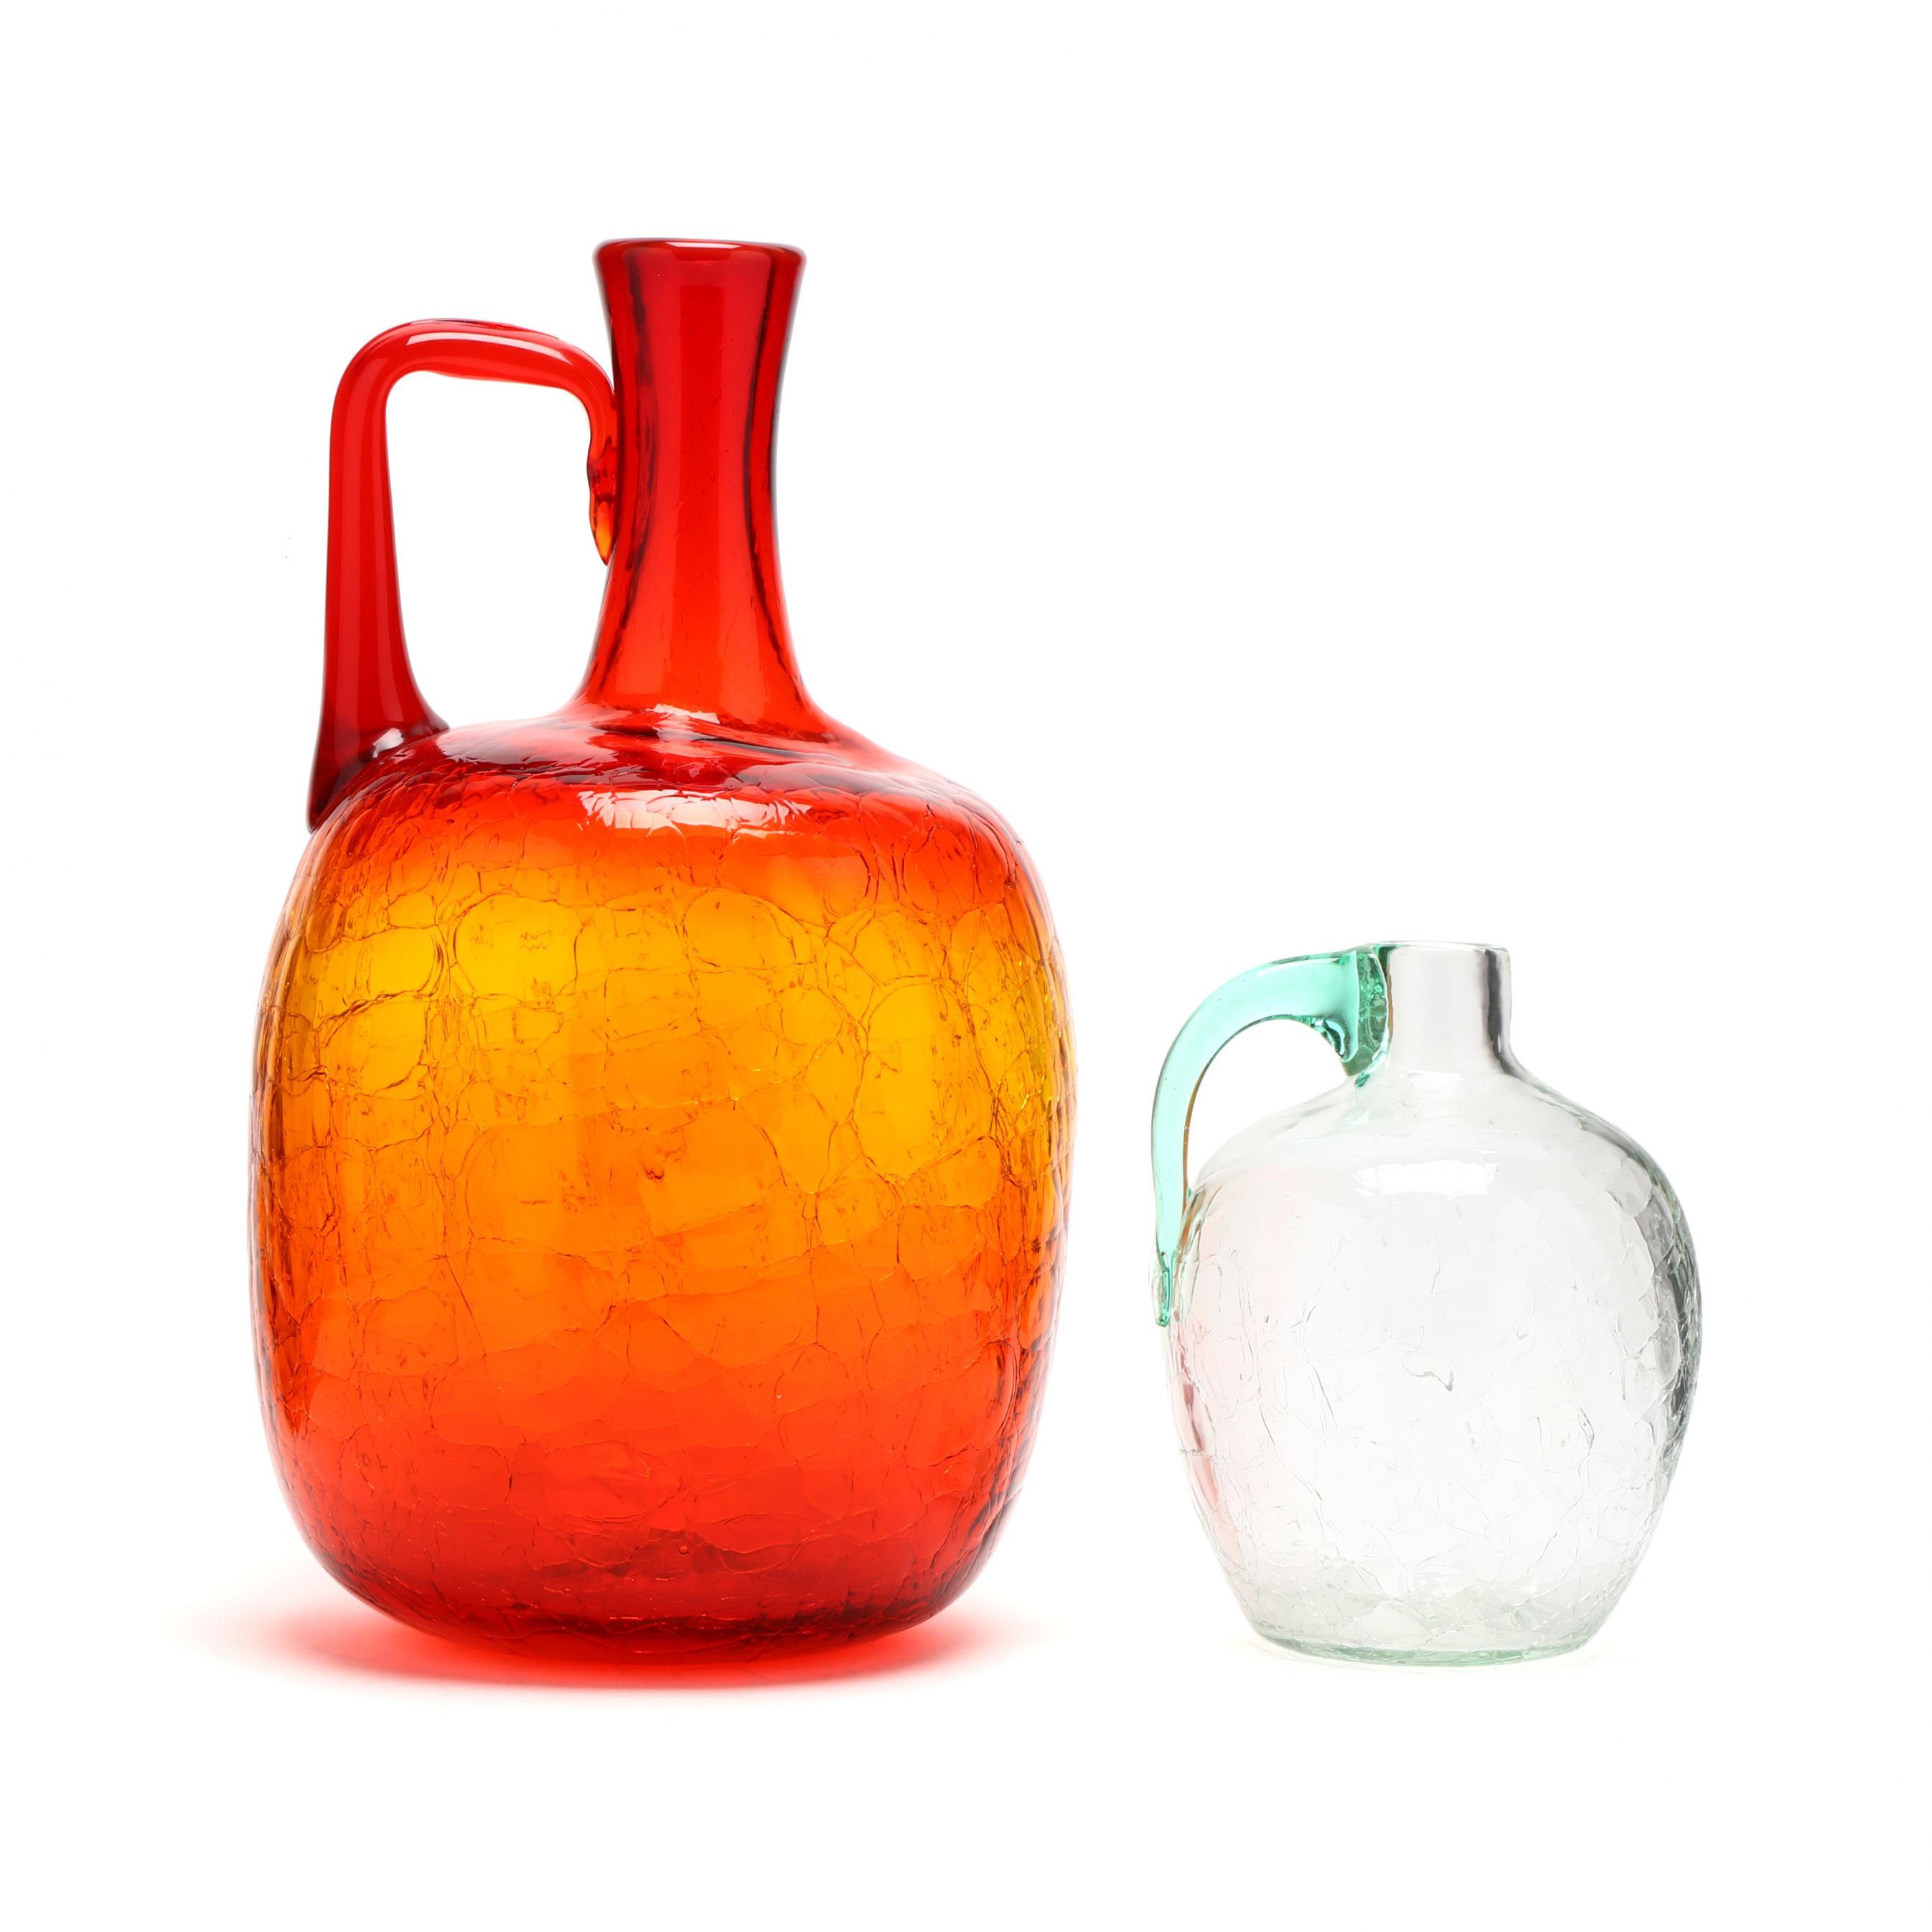 blenko-two-crackle-glass-jugs